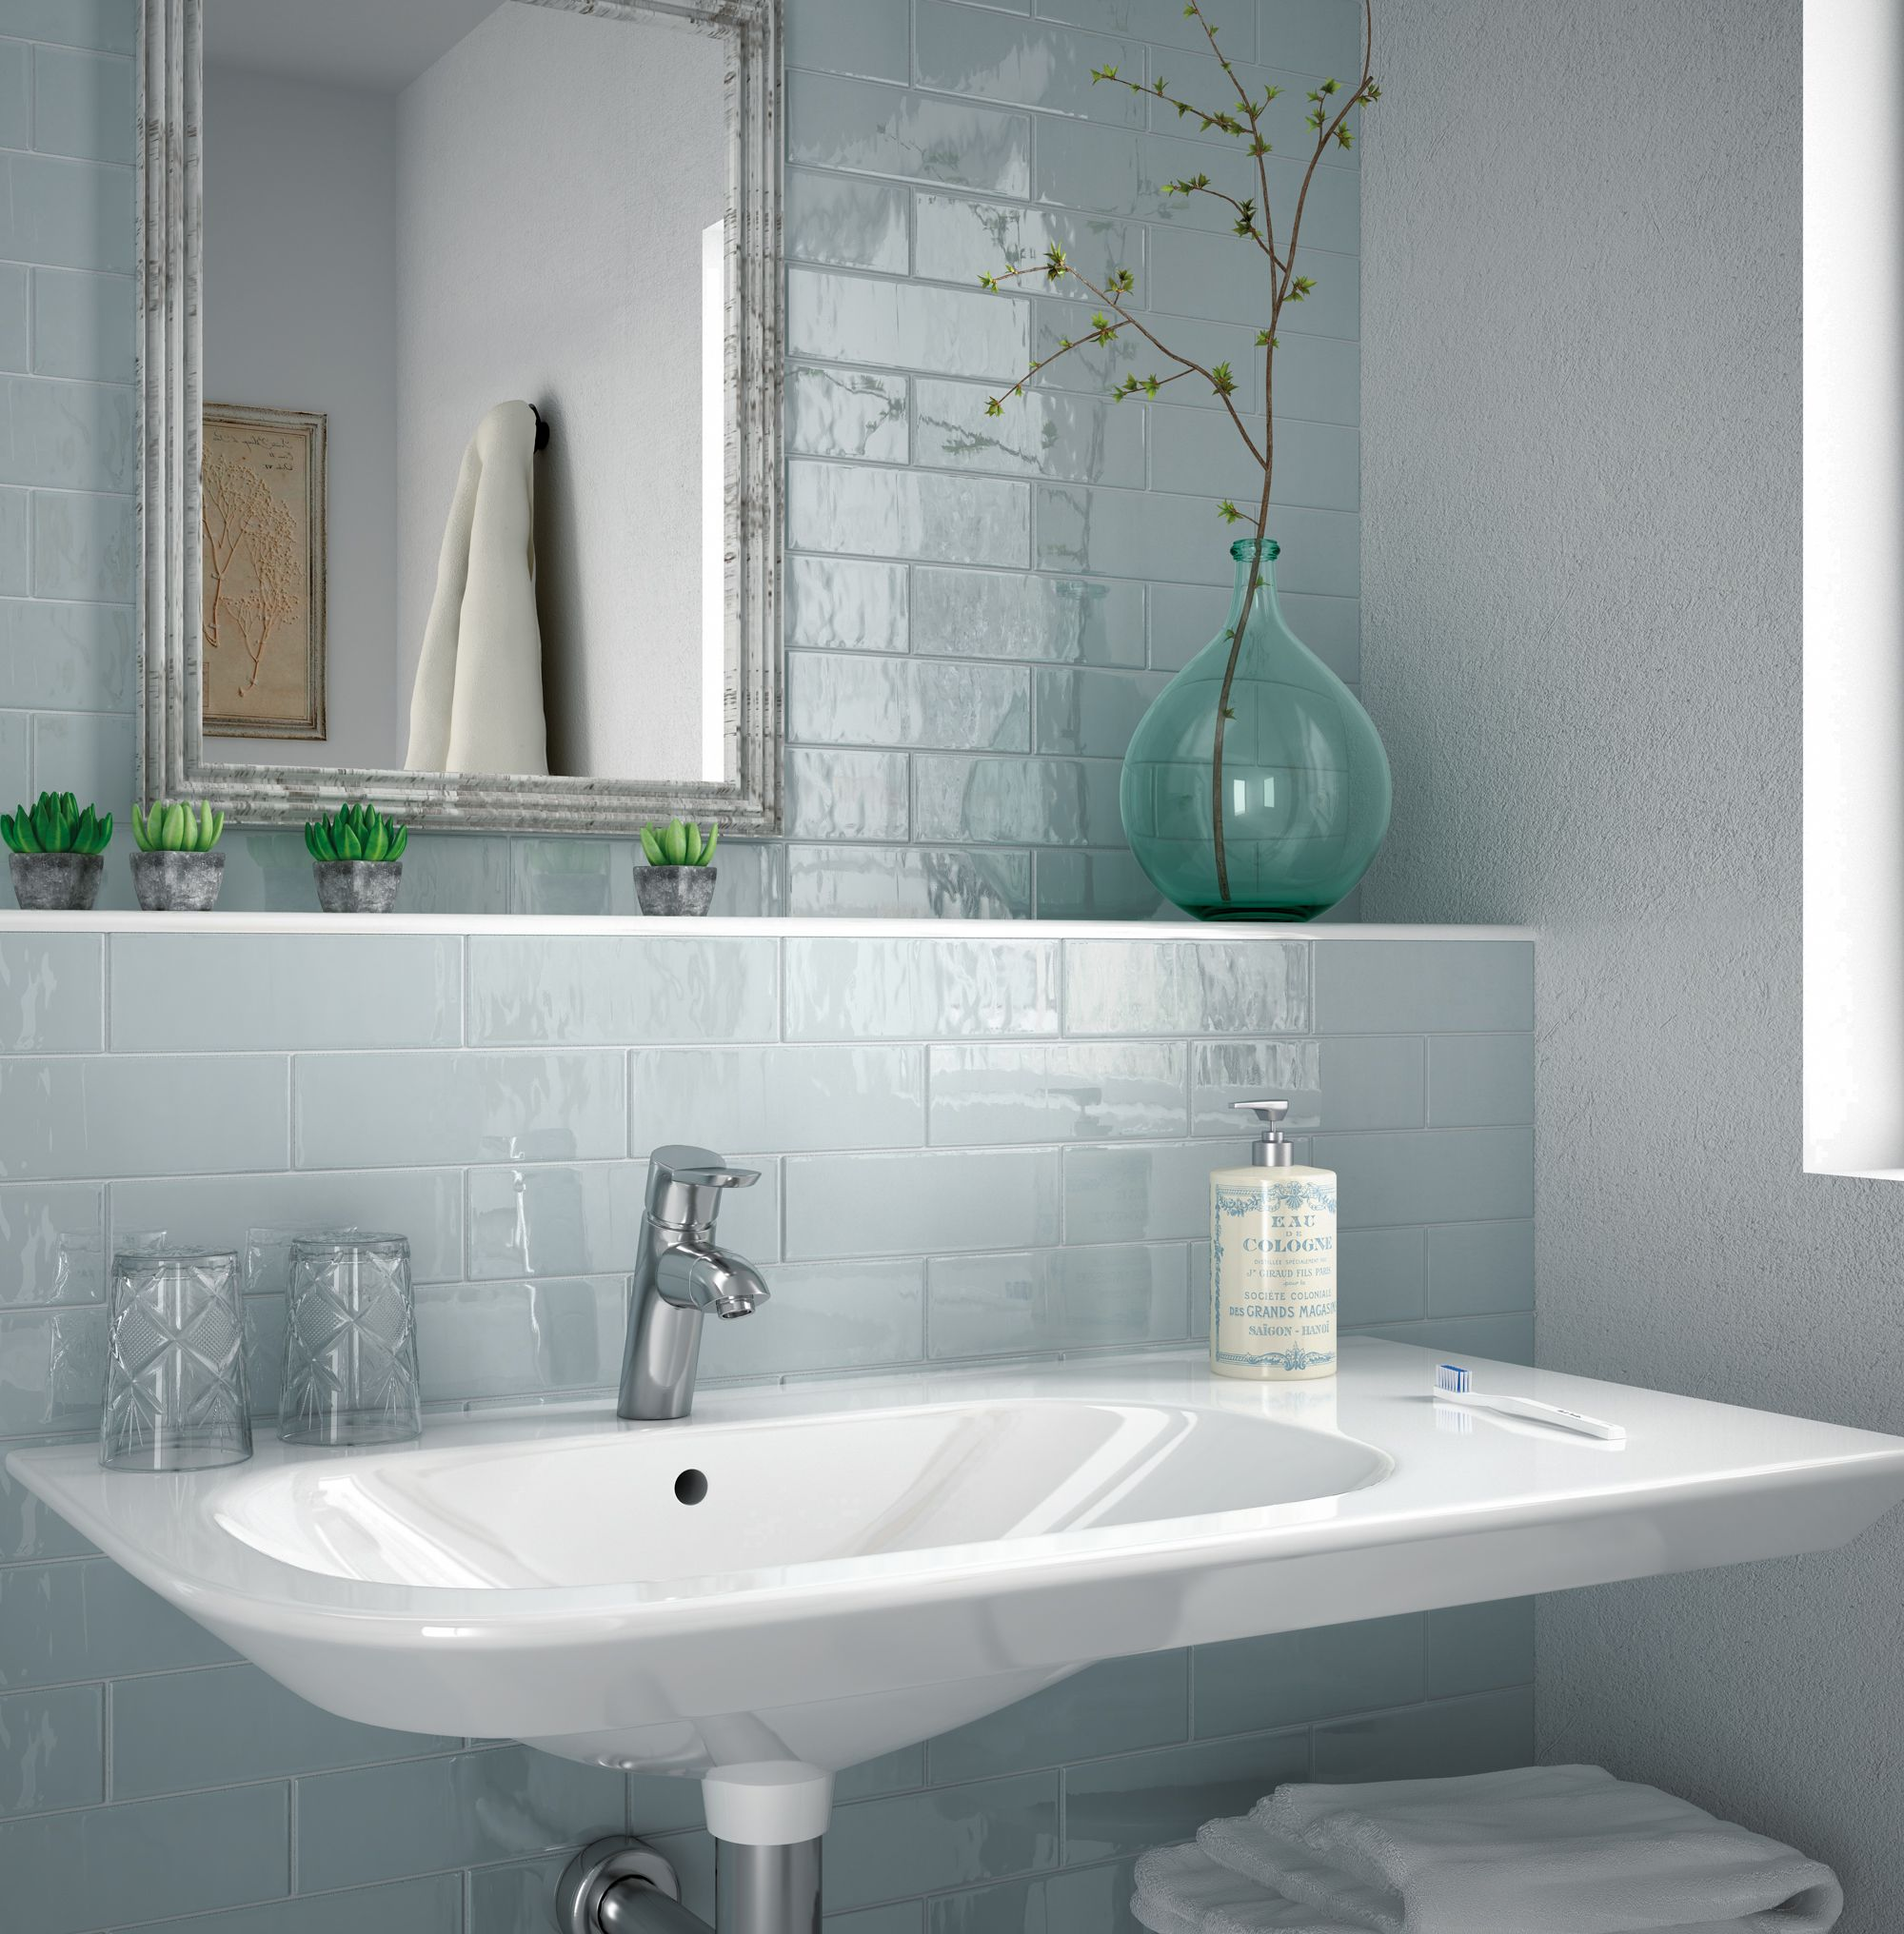 Provence Bathroom Tiles | Brick Shaped Wall Tiles | Pinterest ...